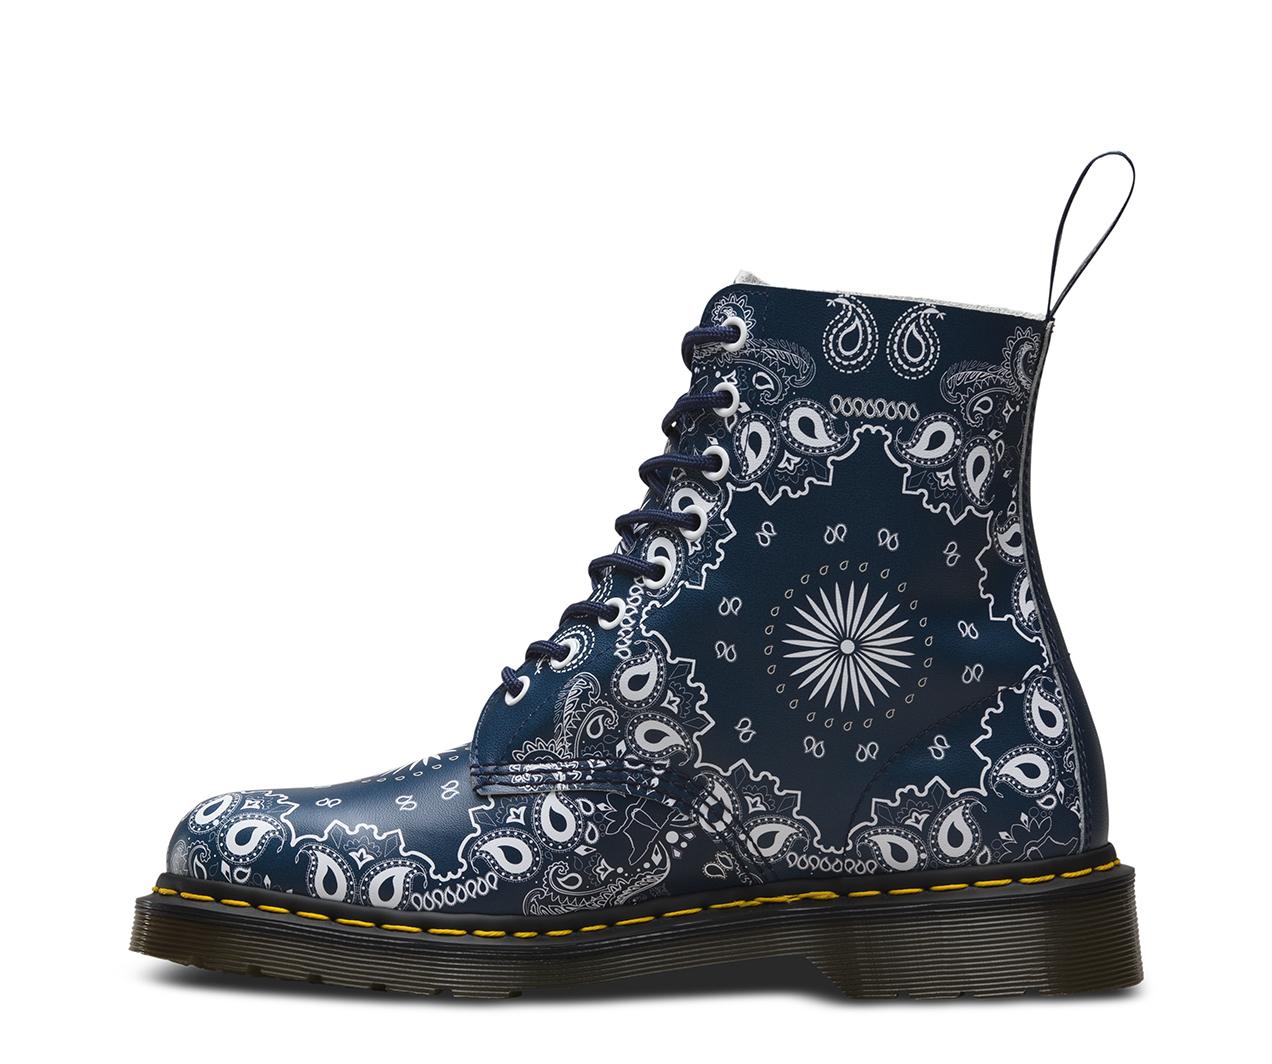 Pascal Bandana Men S Boots Official Dr Martens Store Uk